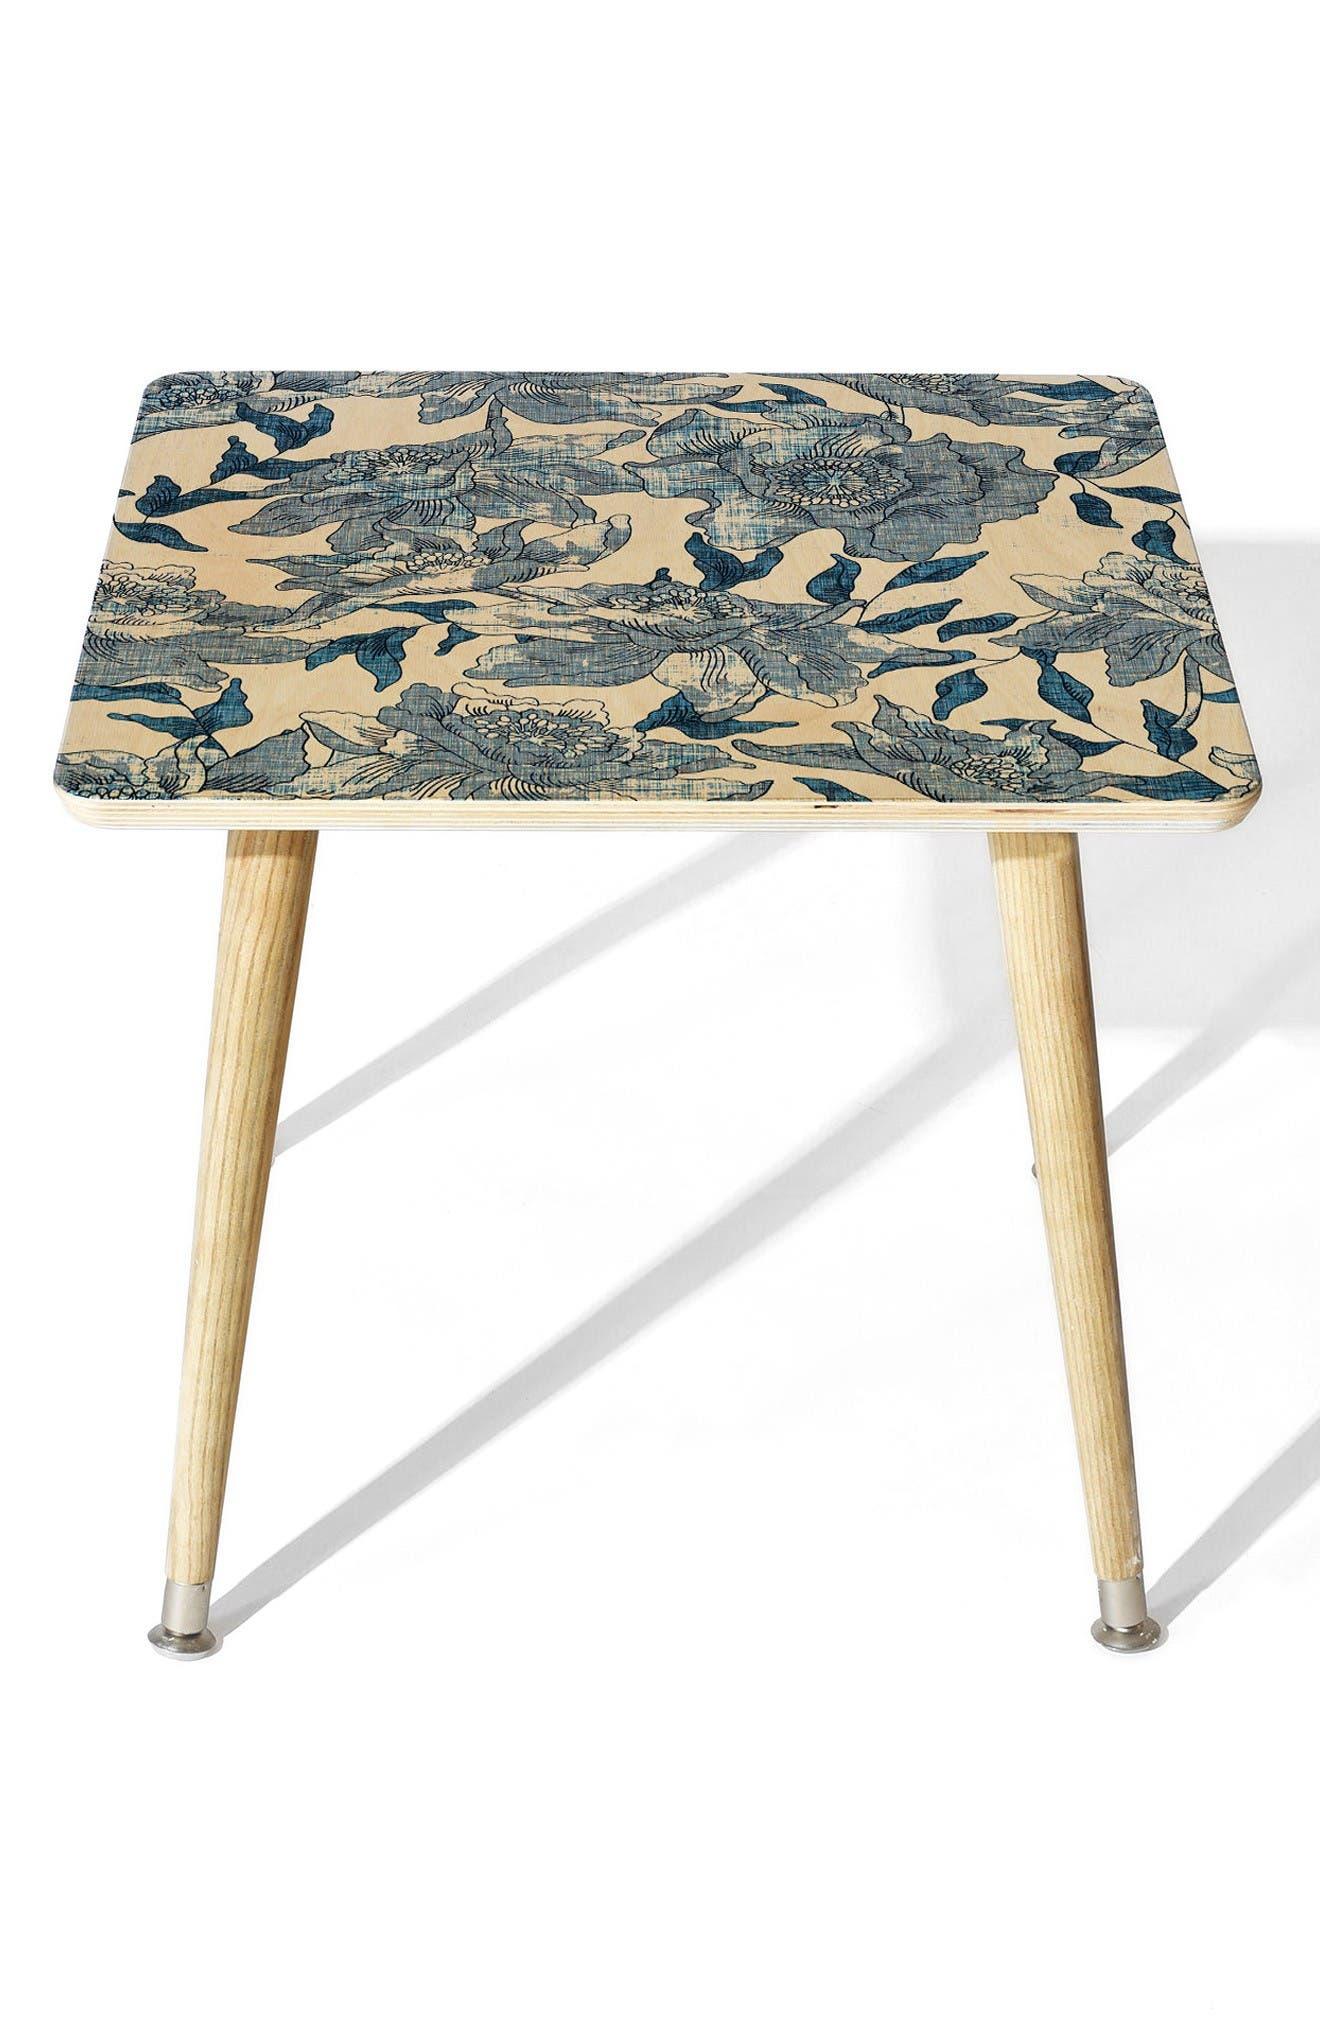 Alternate Image 1 Selected - Deny Designs Summertime Indigo Side Table